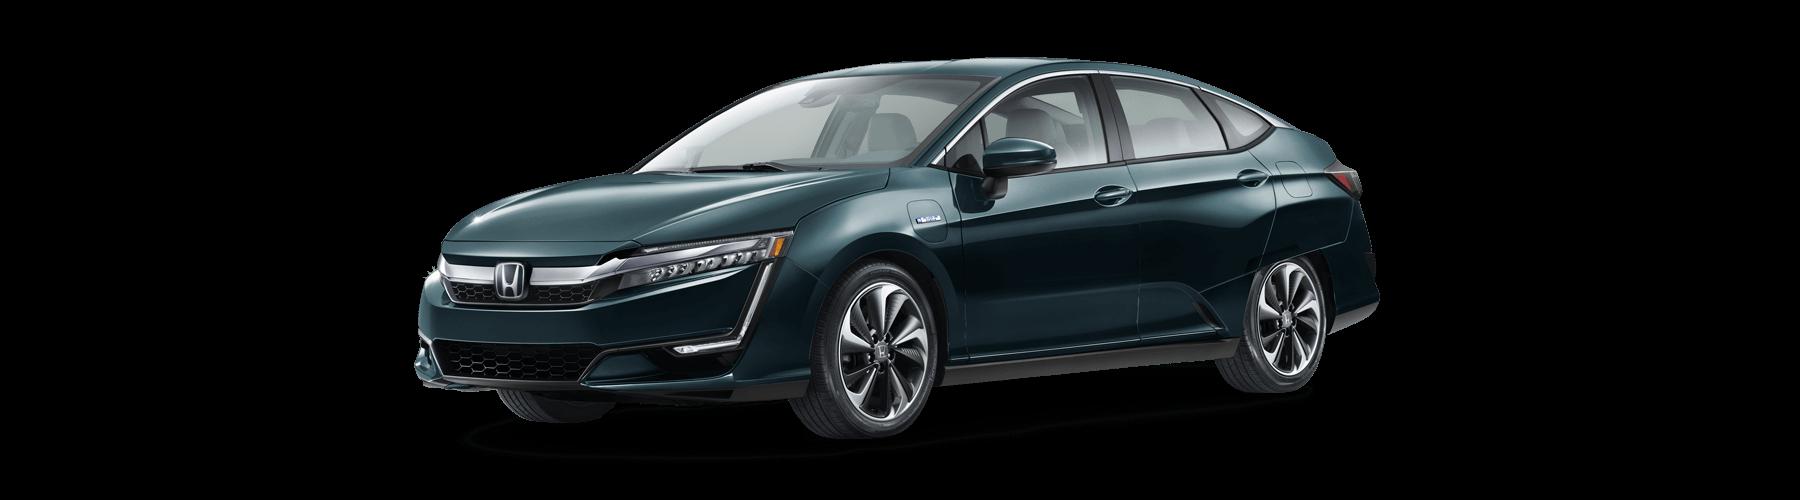 2018 Honda Clarity Plug-In Hybrid Front Angle